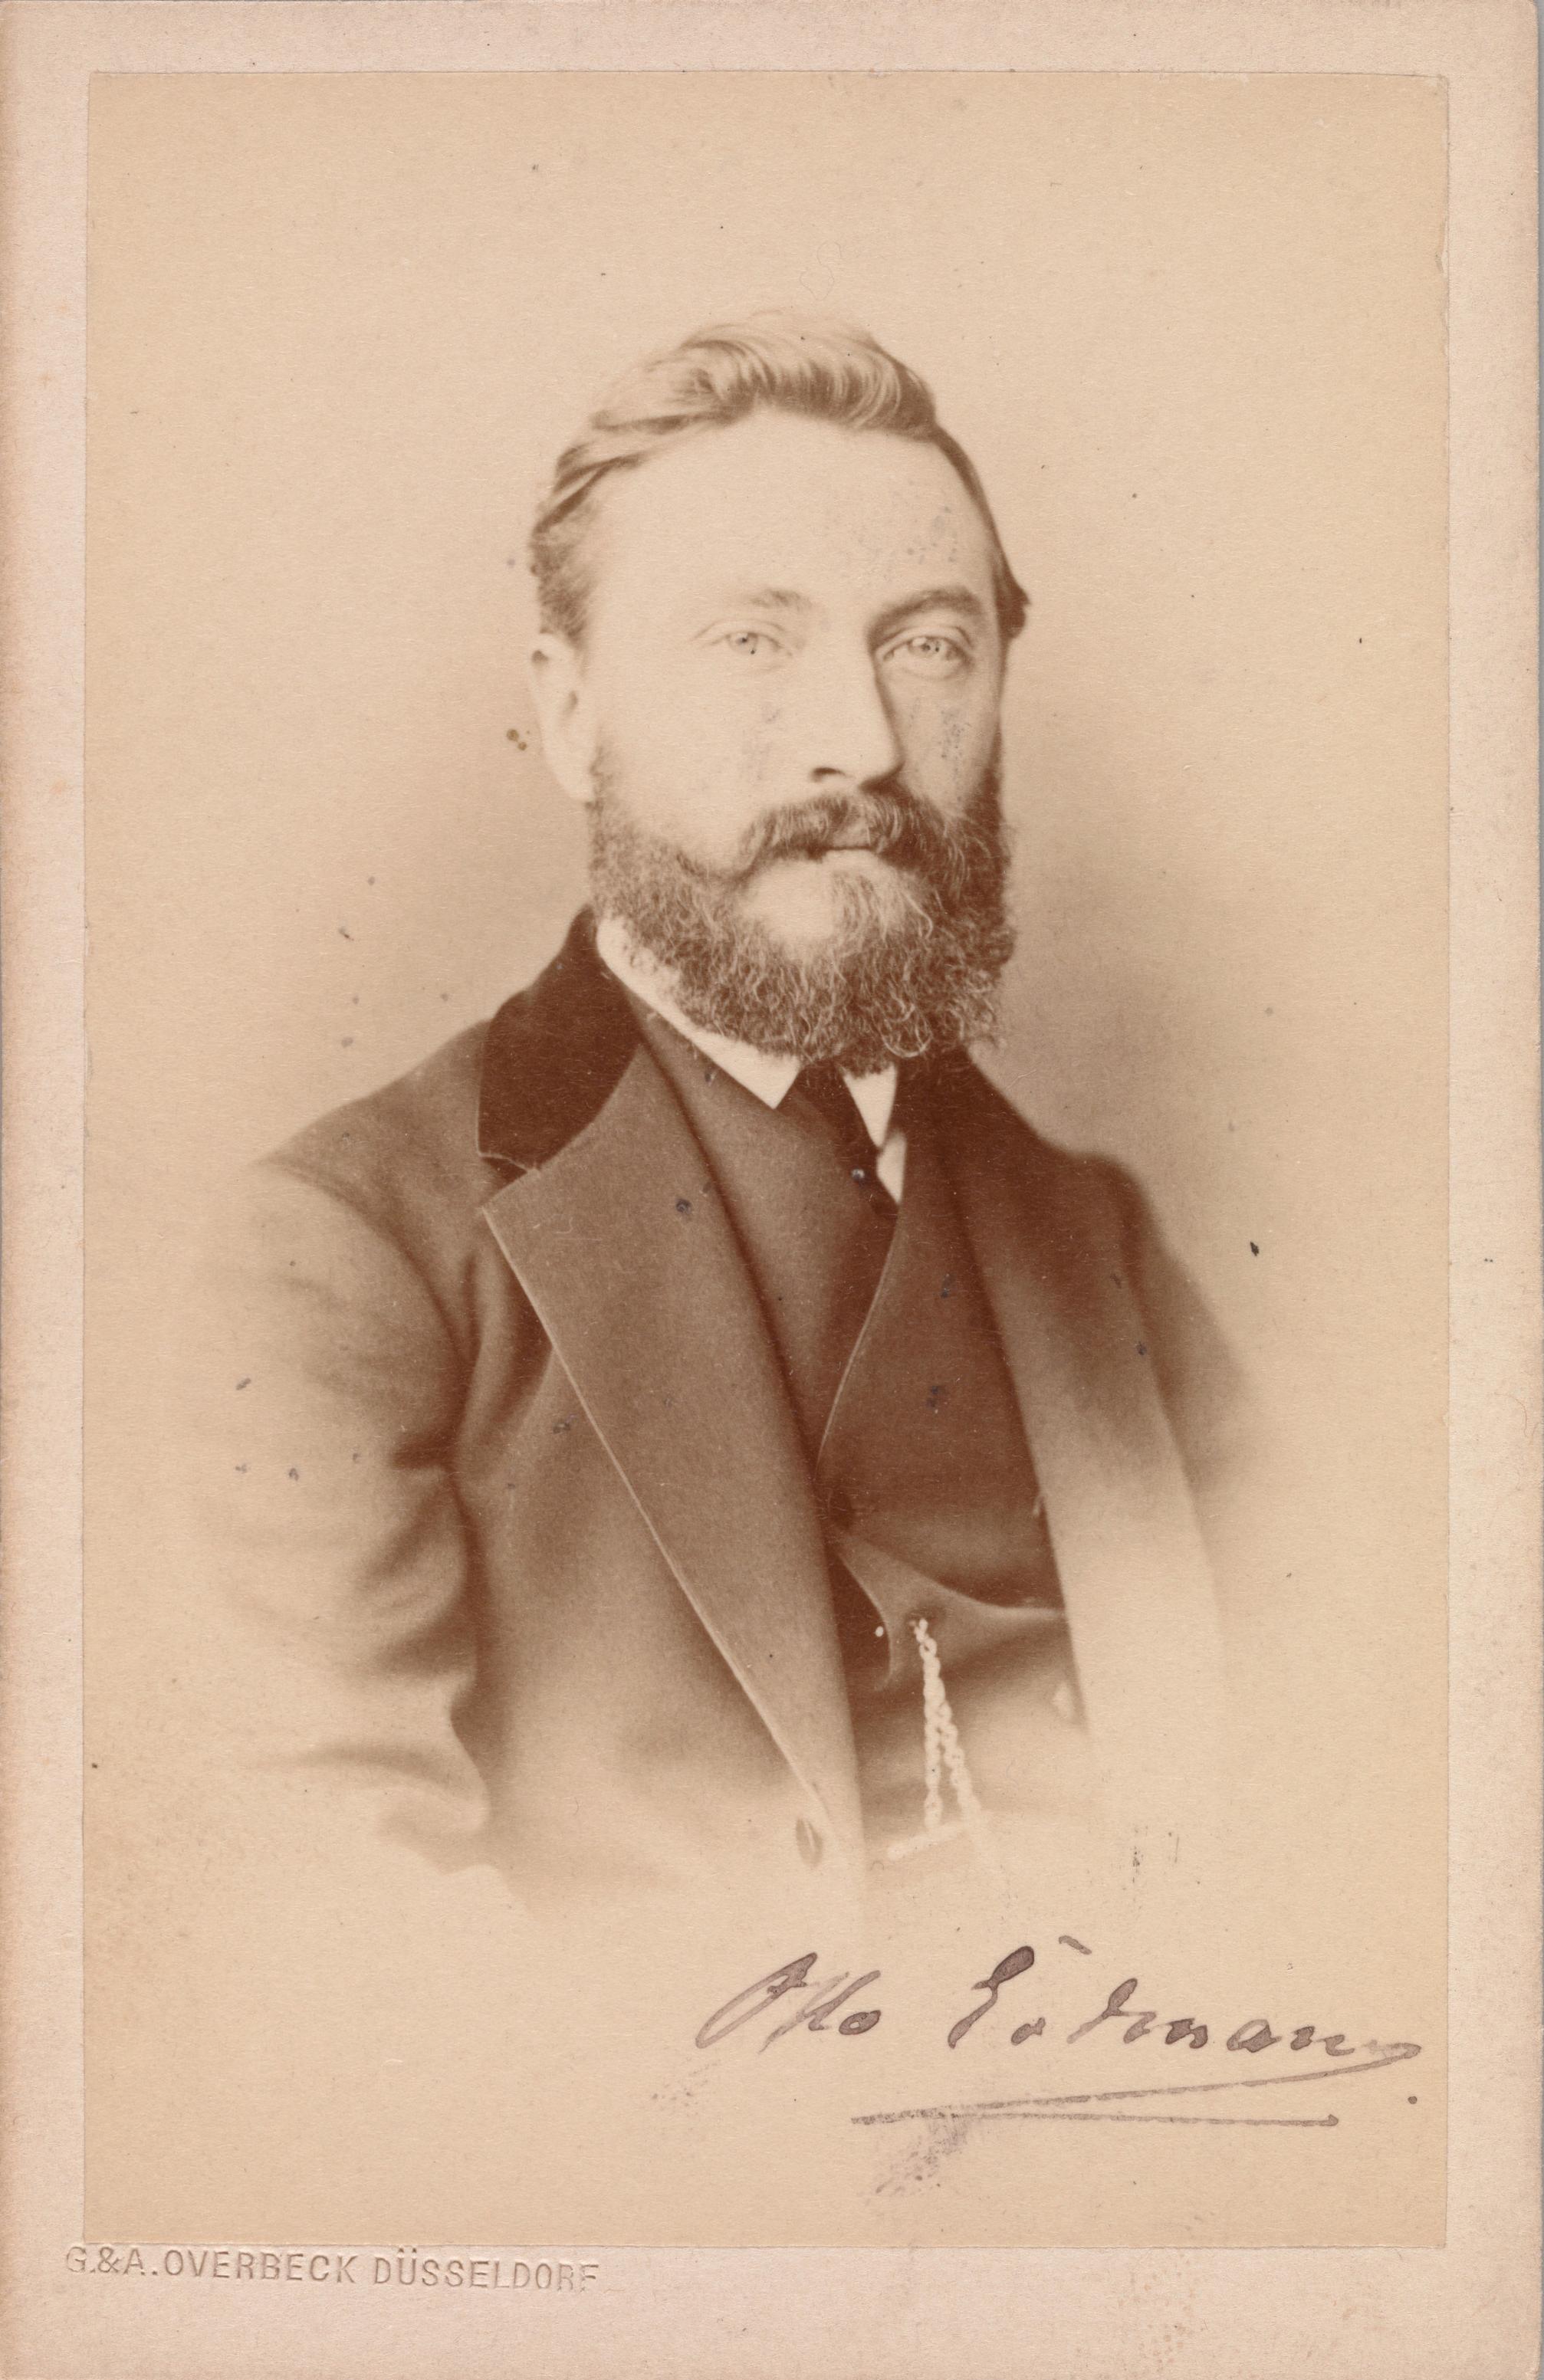 Otto Erdmann Maler Wikipedia